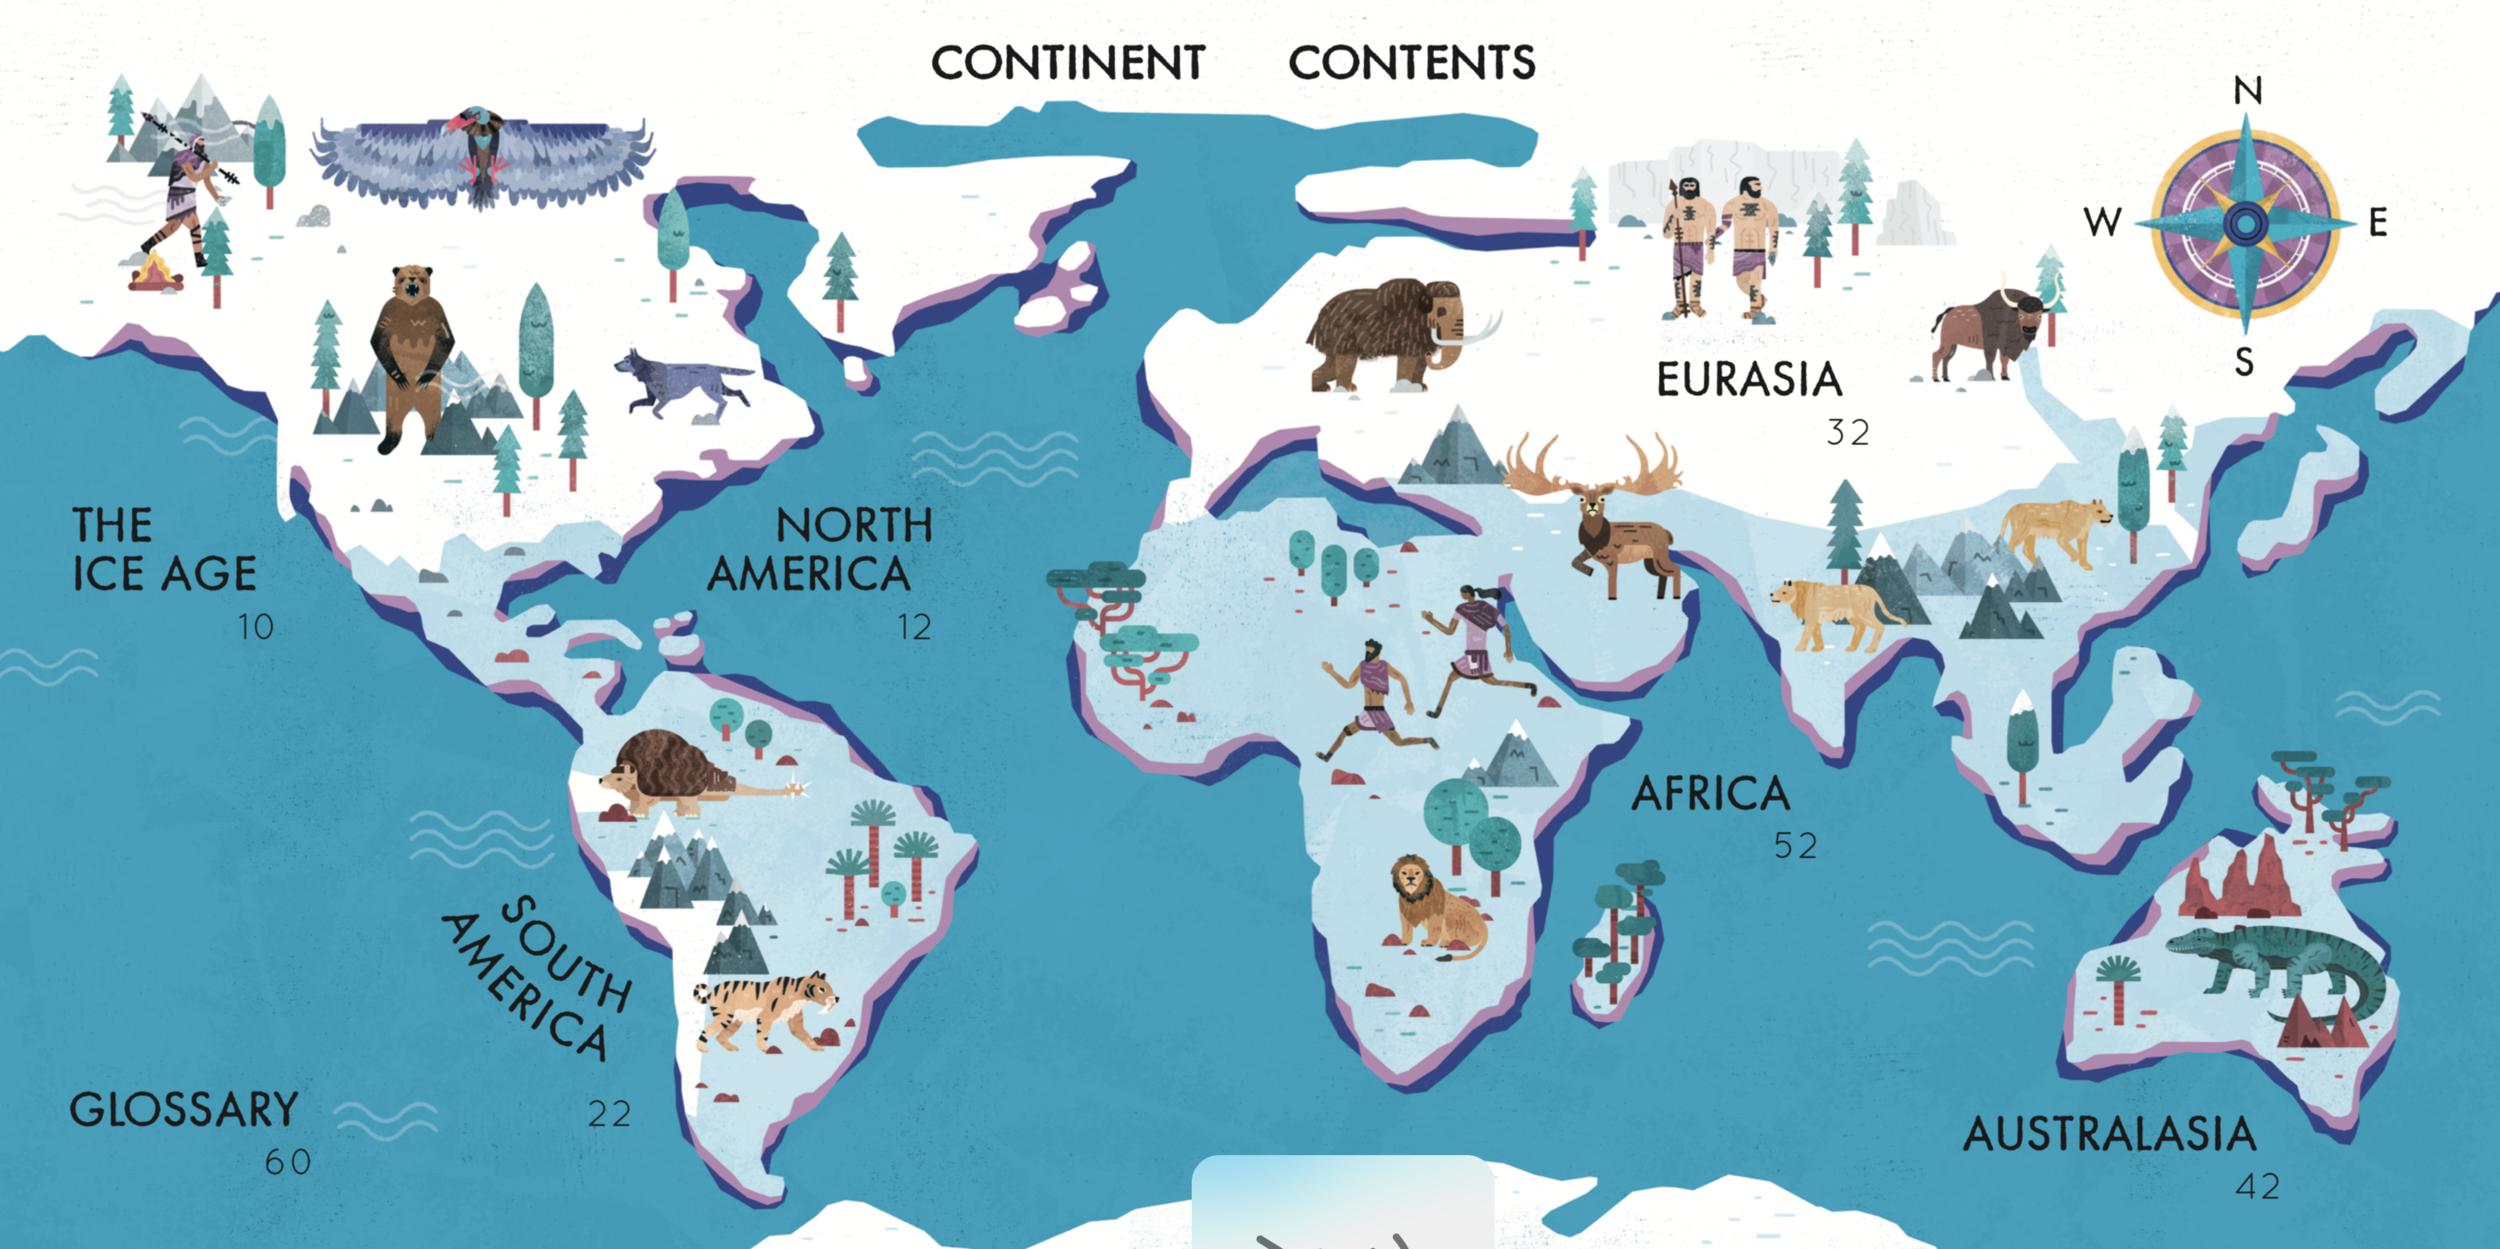 Continent Contents